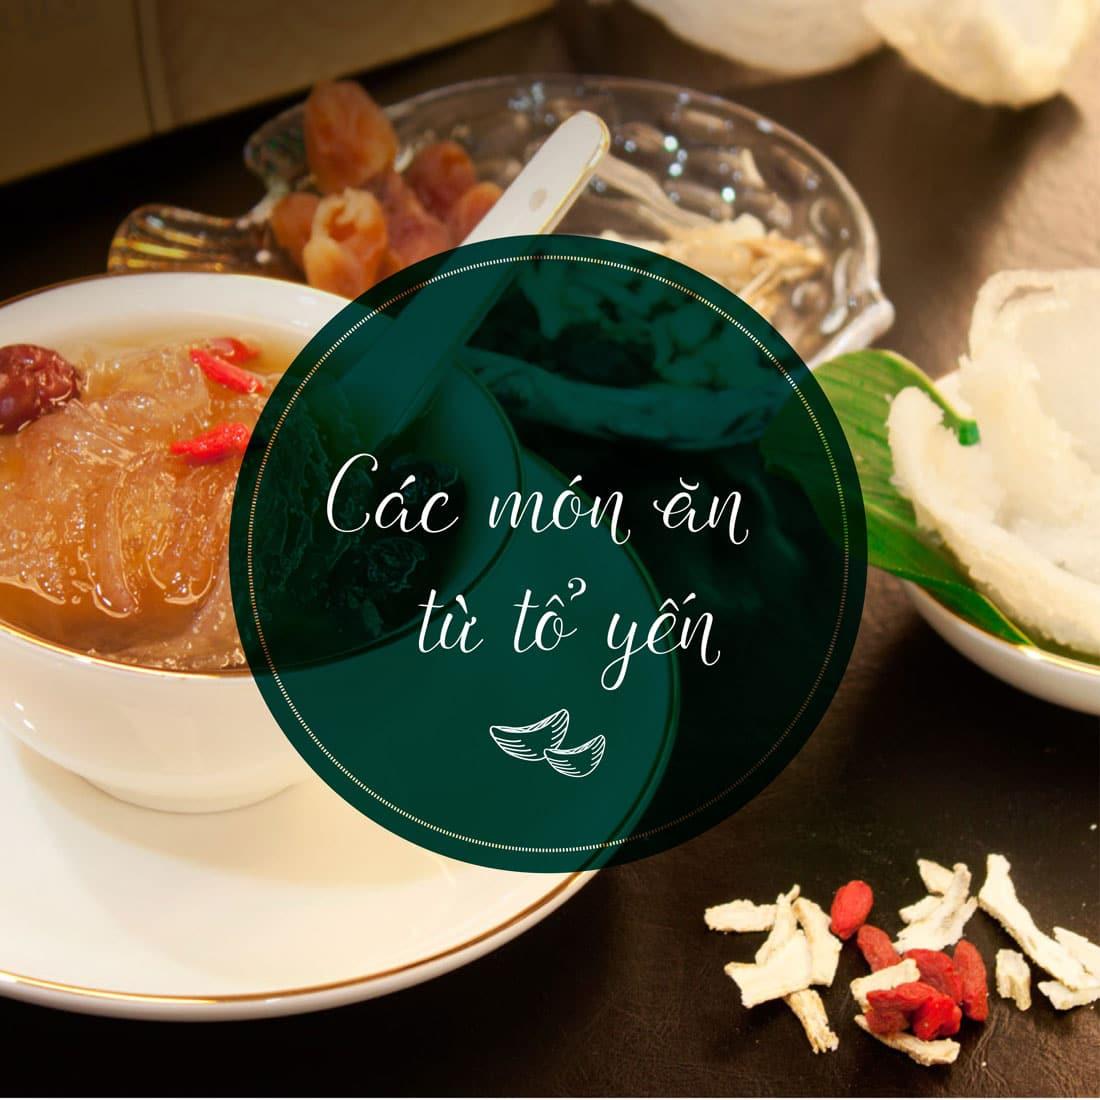 cac-mon-an-tu-to-yen-1